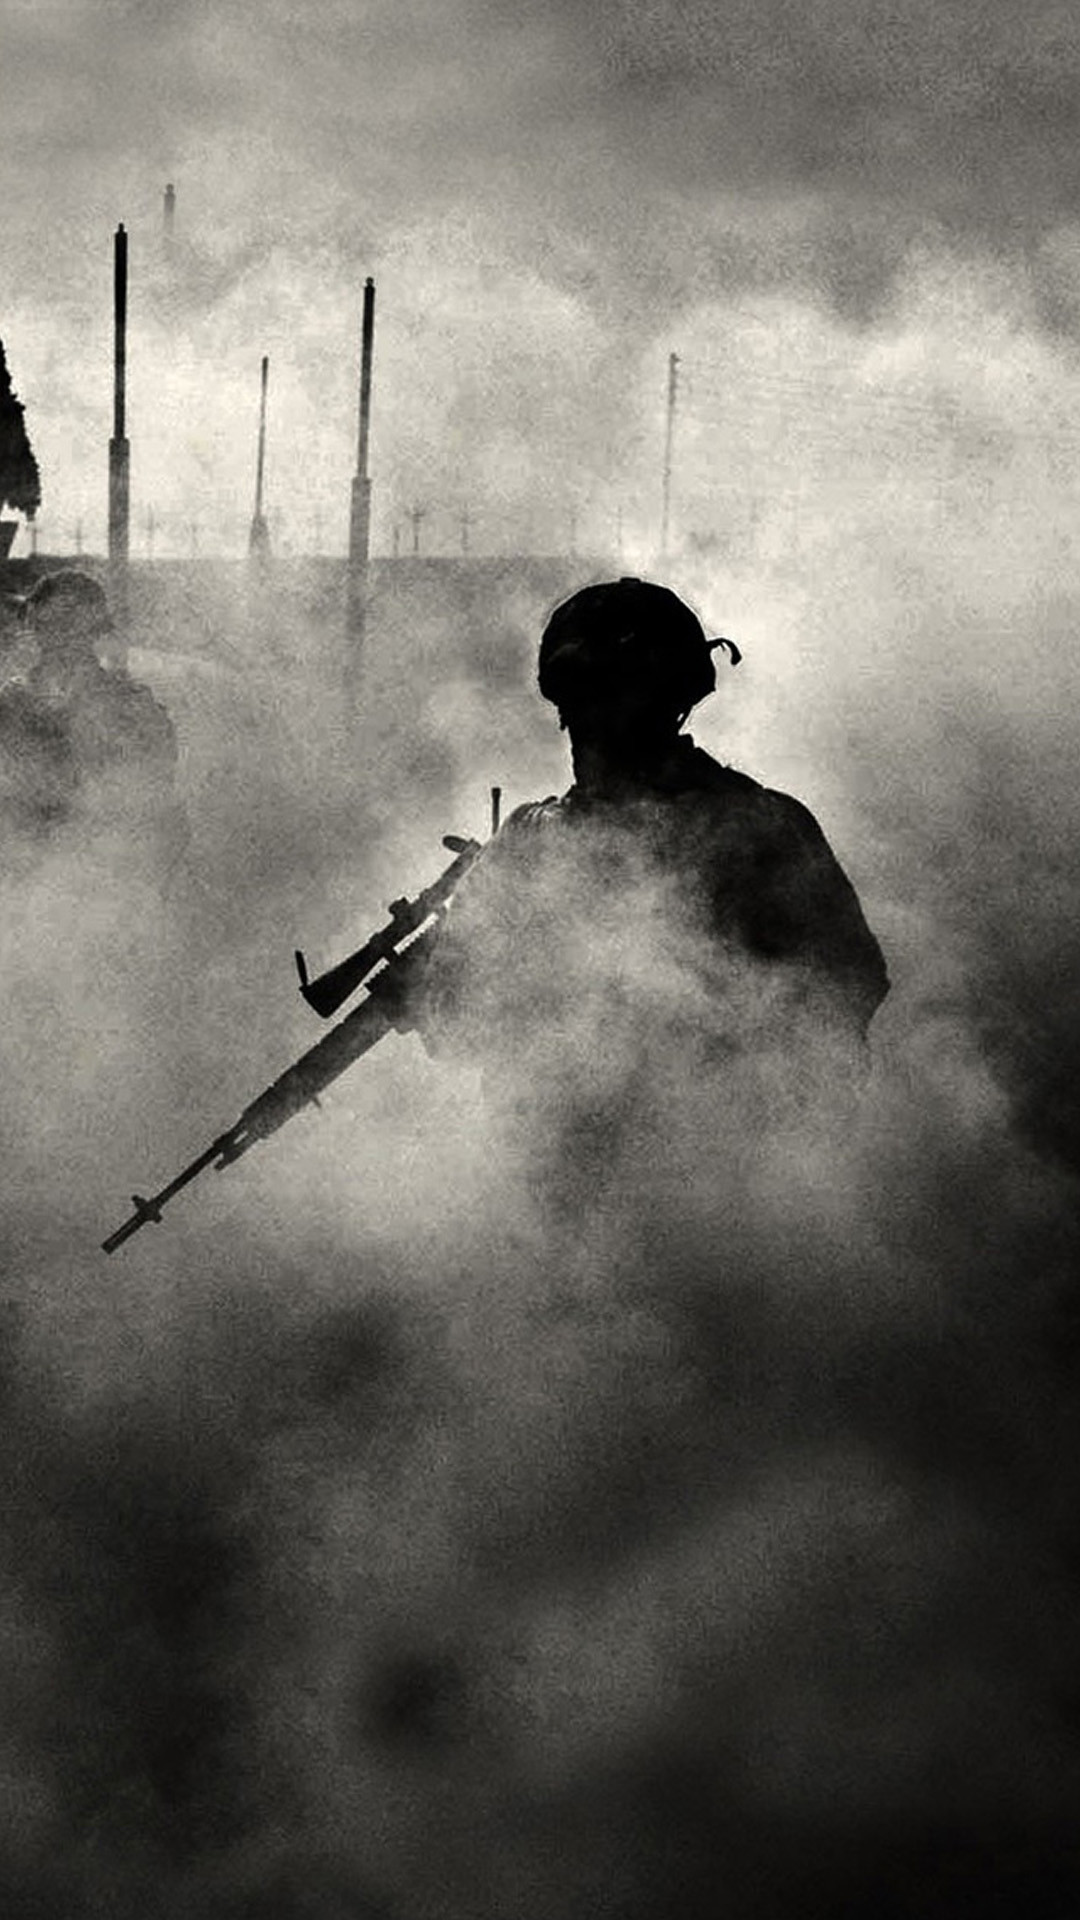 Sfondi Militari (67+ immagini)